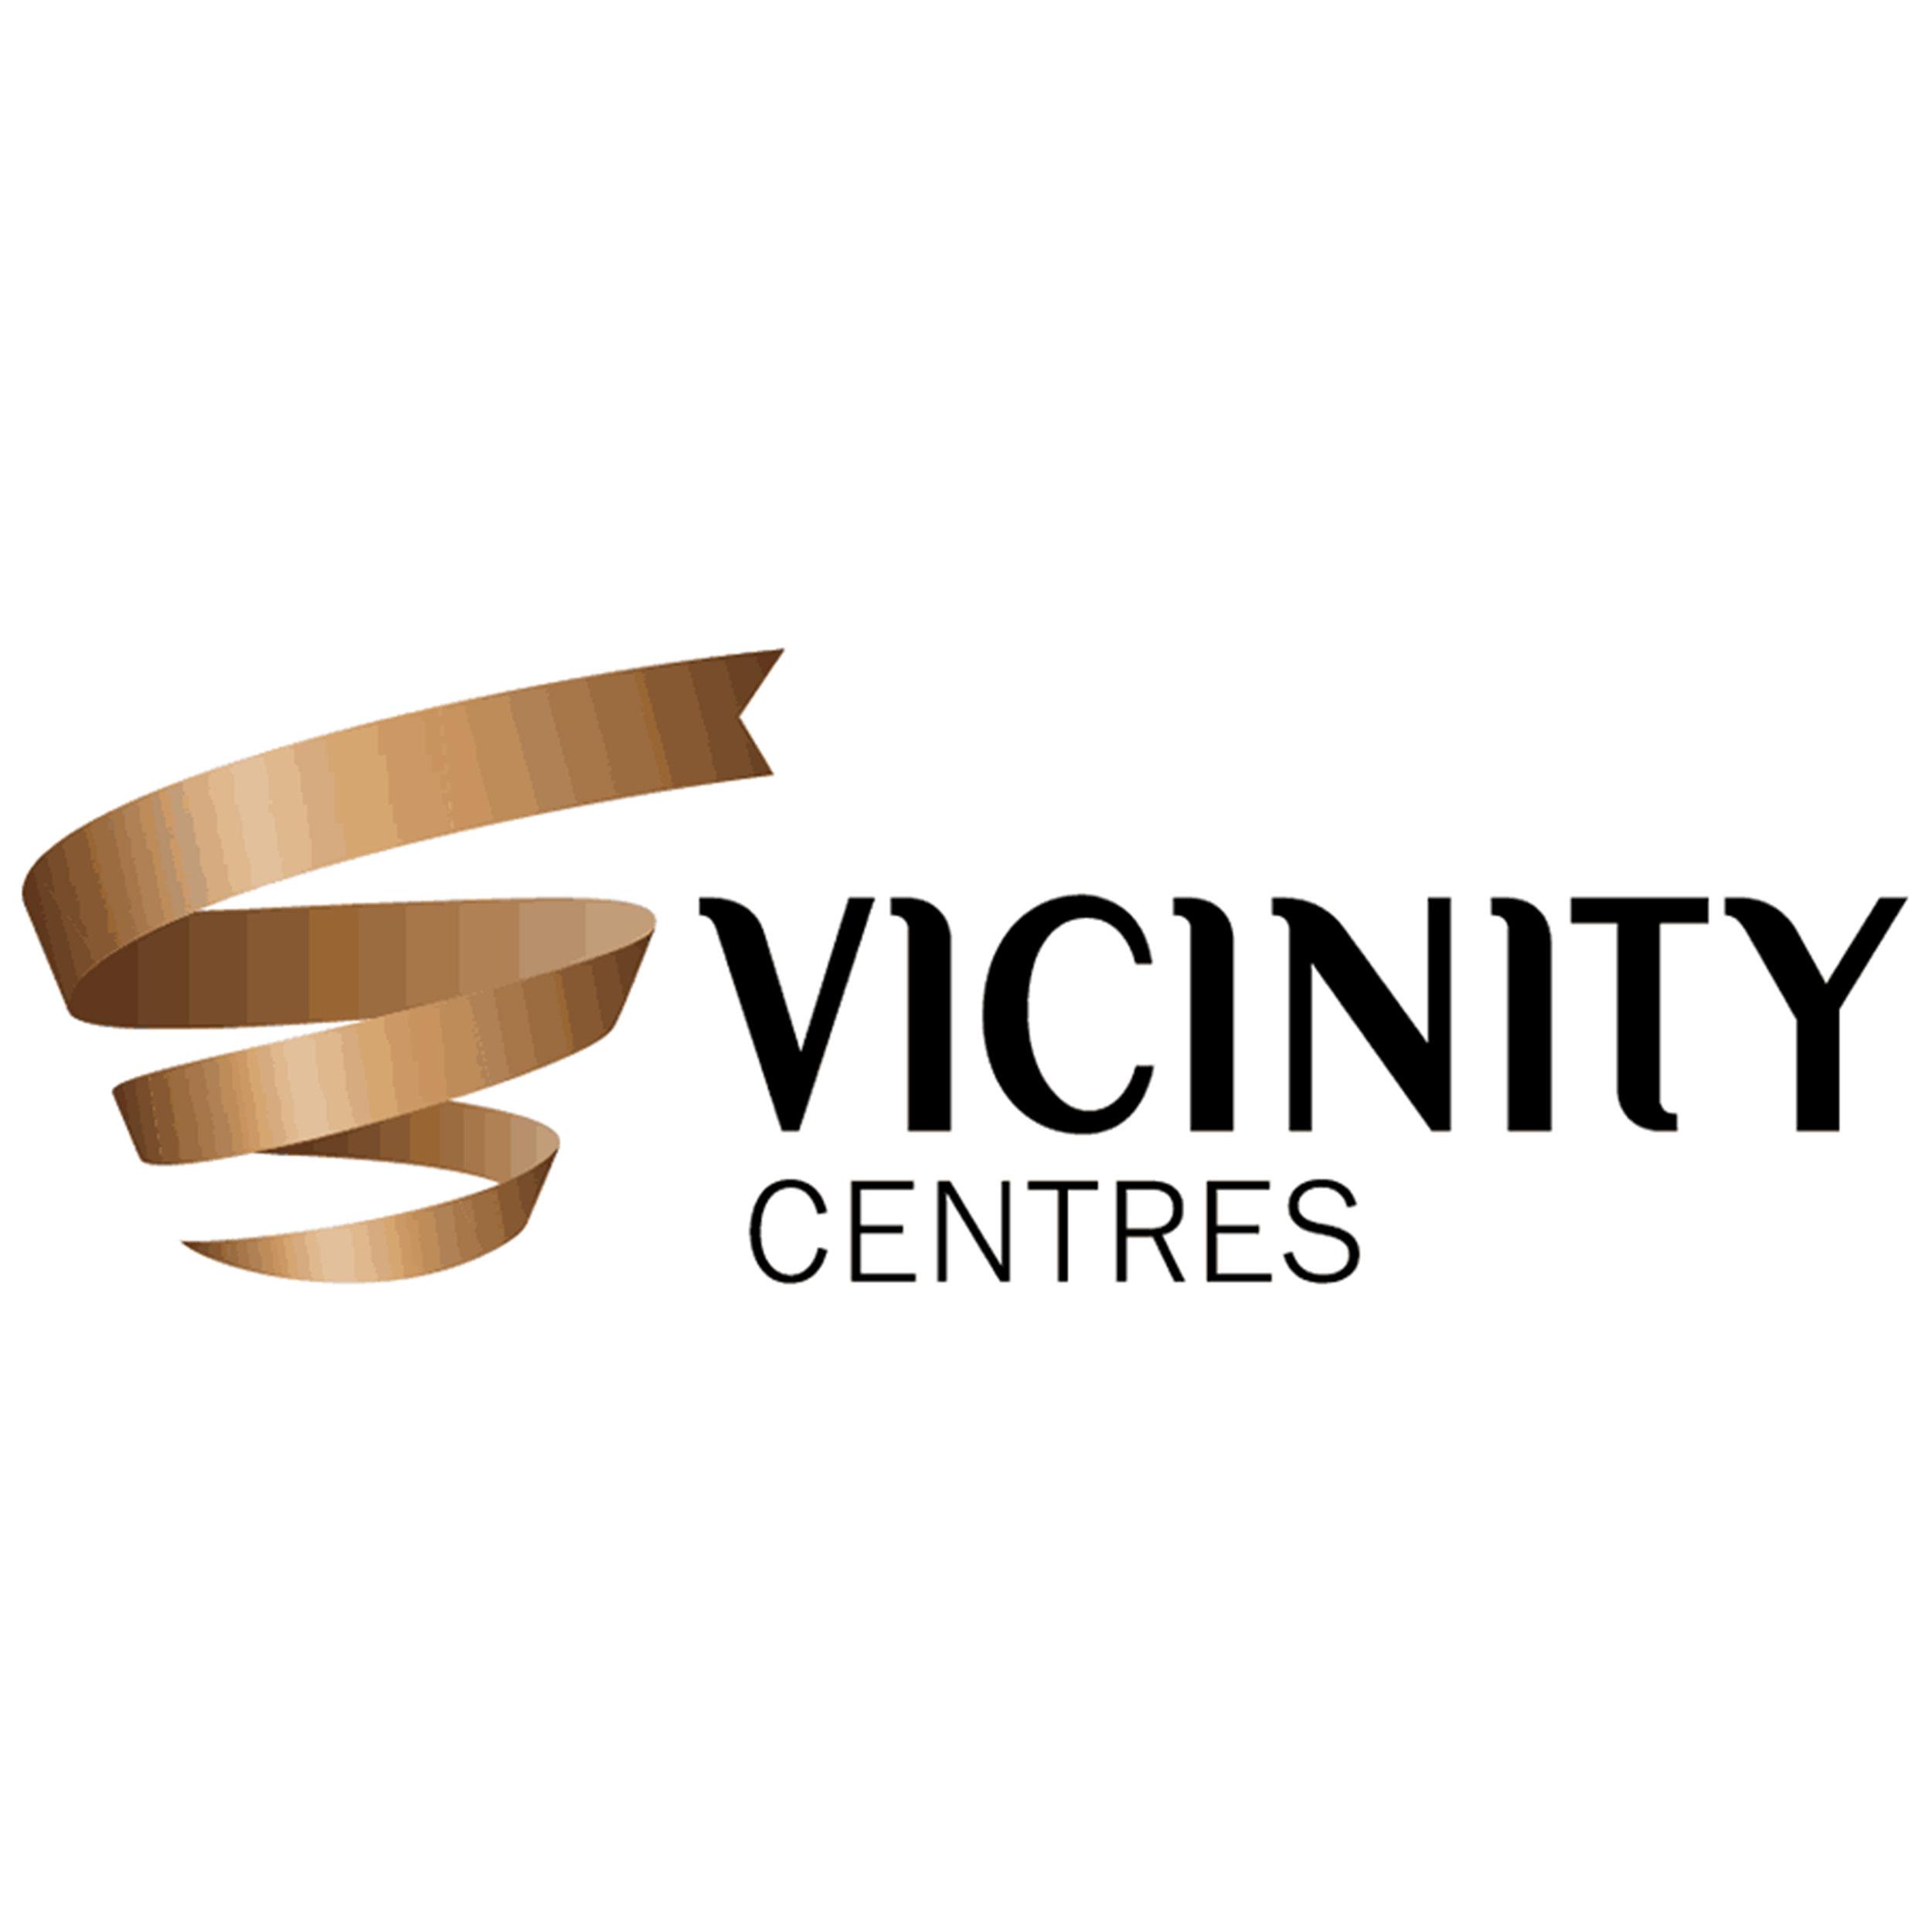 Vicinity.jpg